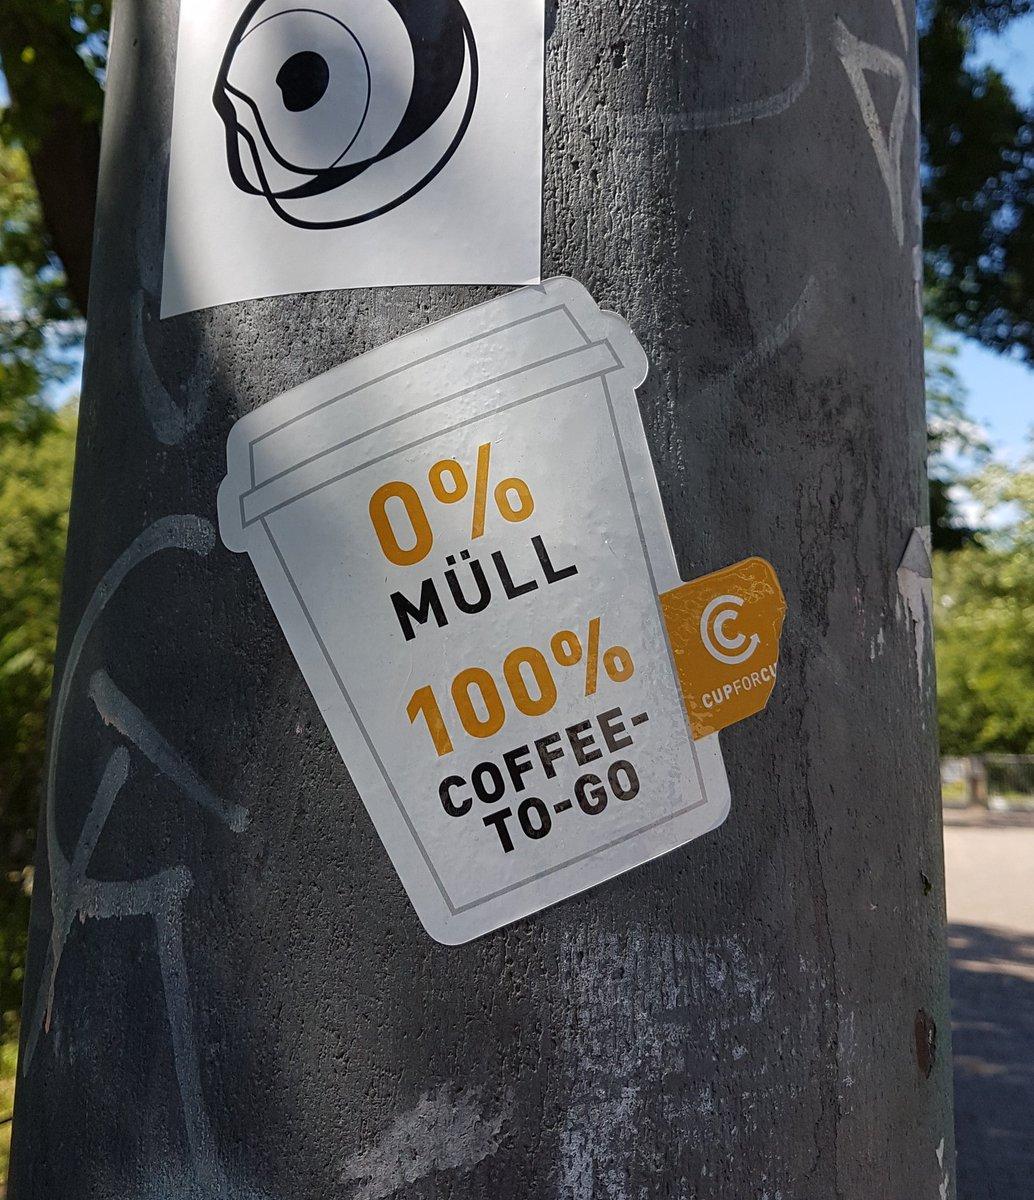 #Plastikmüll #coffeetogo #FridaysforFuture #sticker https://t.co/Z288heA1av